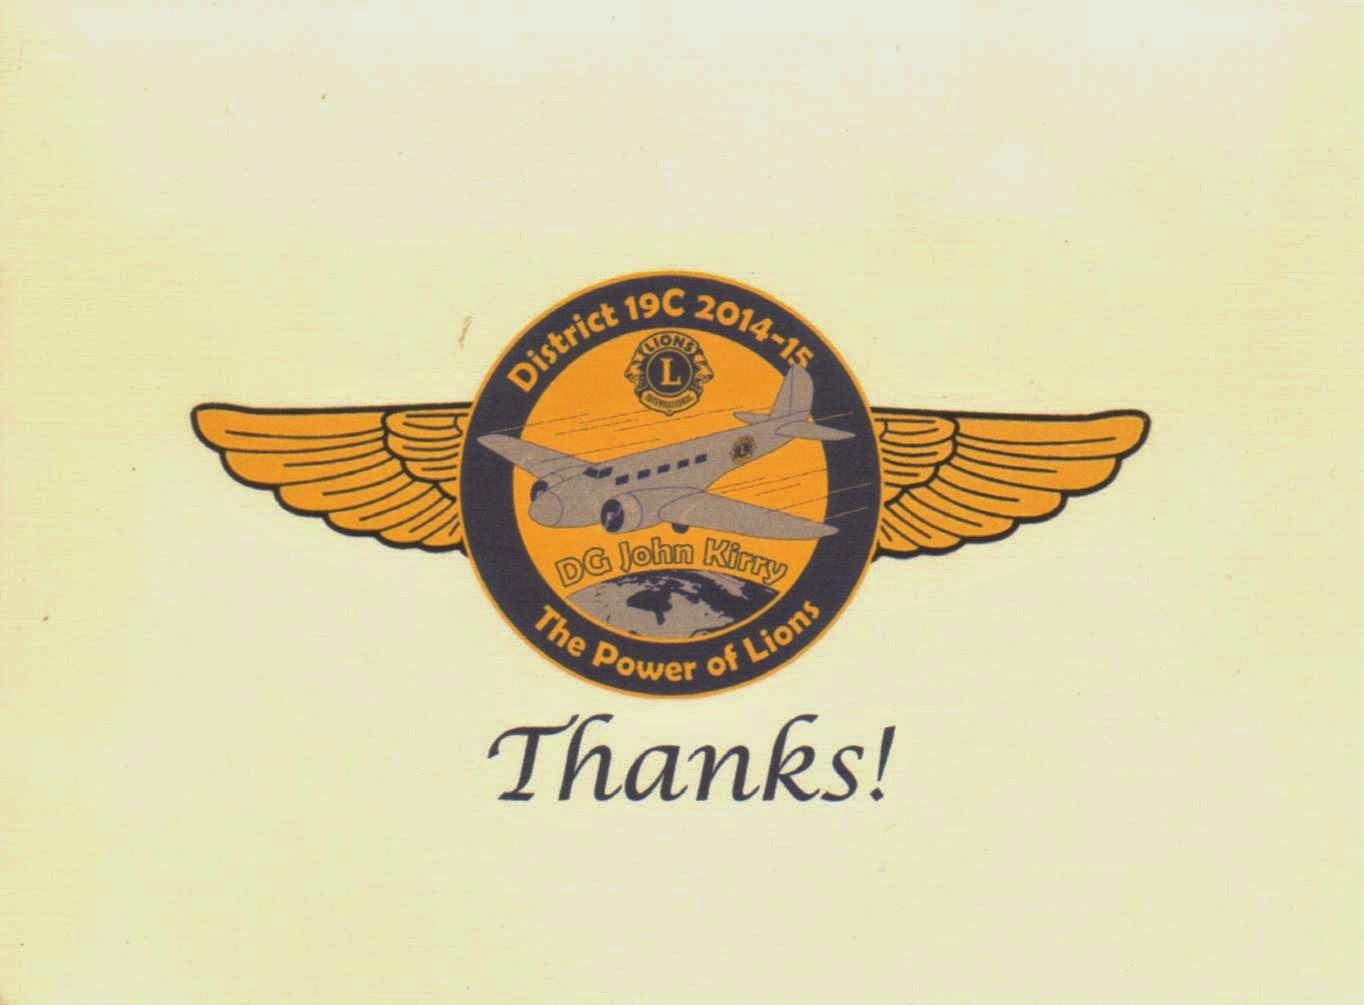 Rainier Lions Club Thank You Card From Dg John Kirry